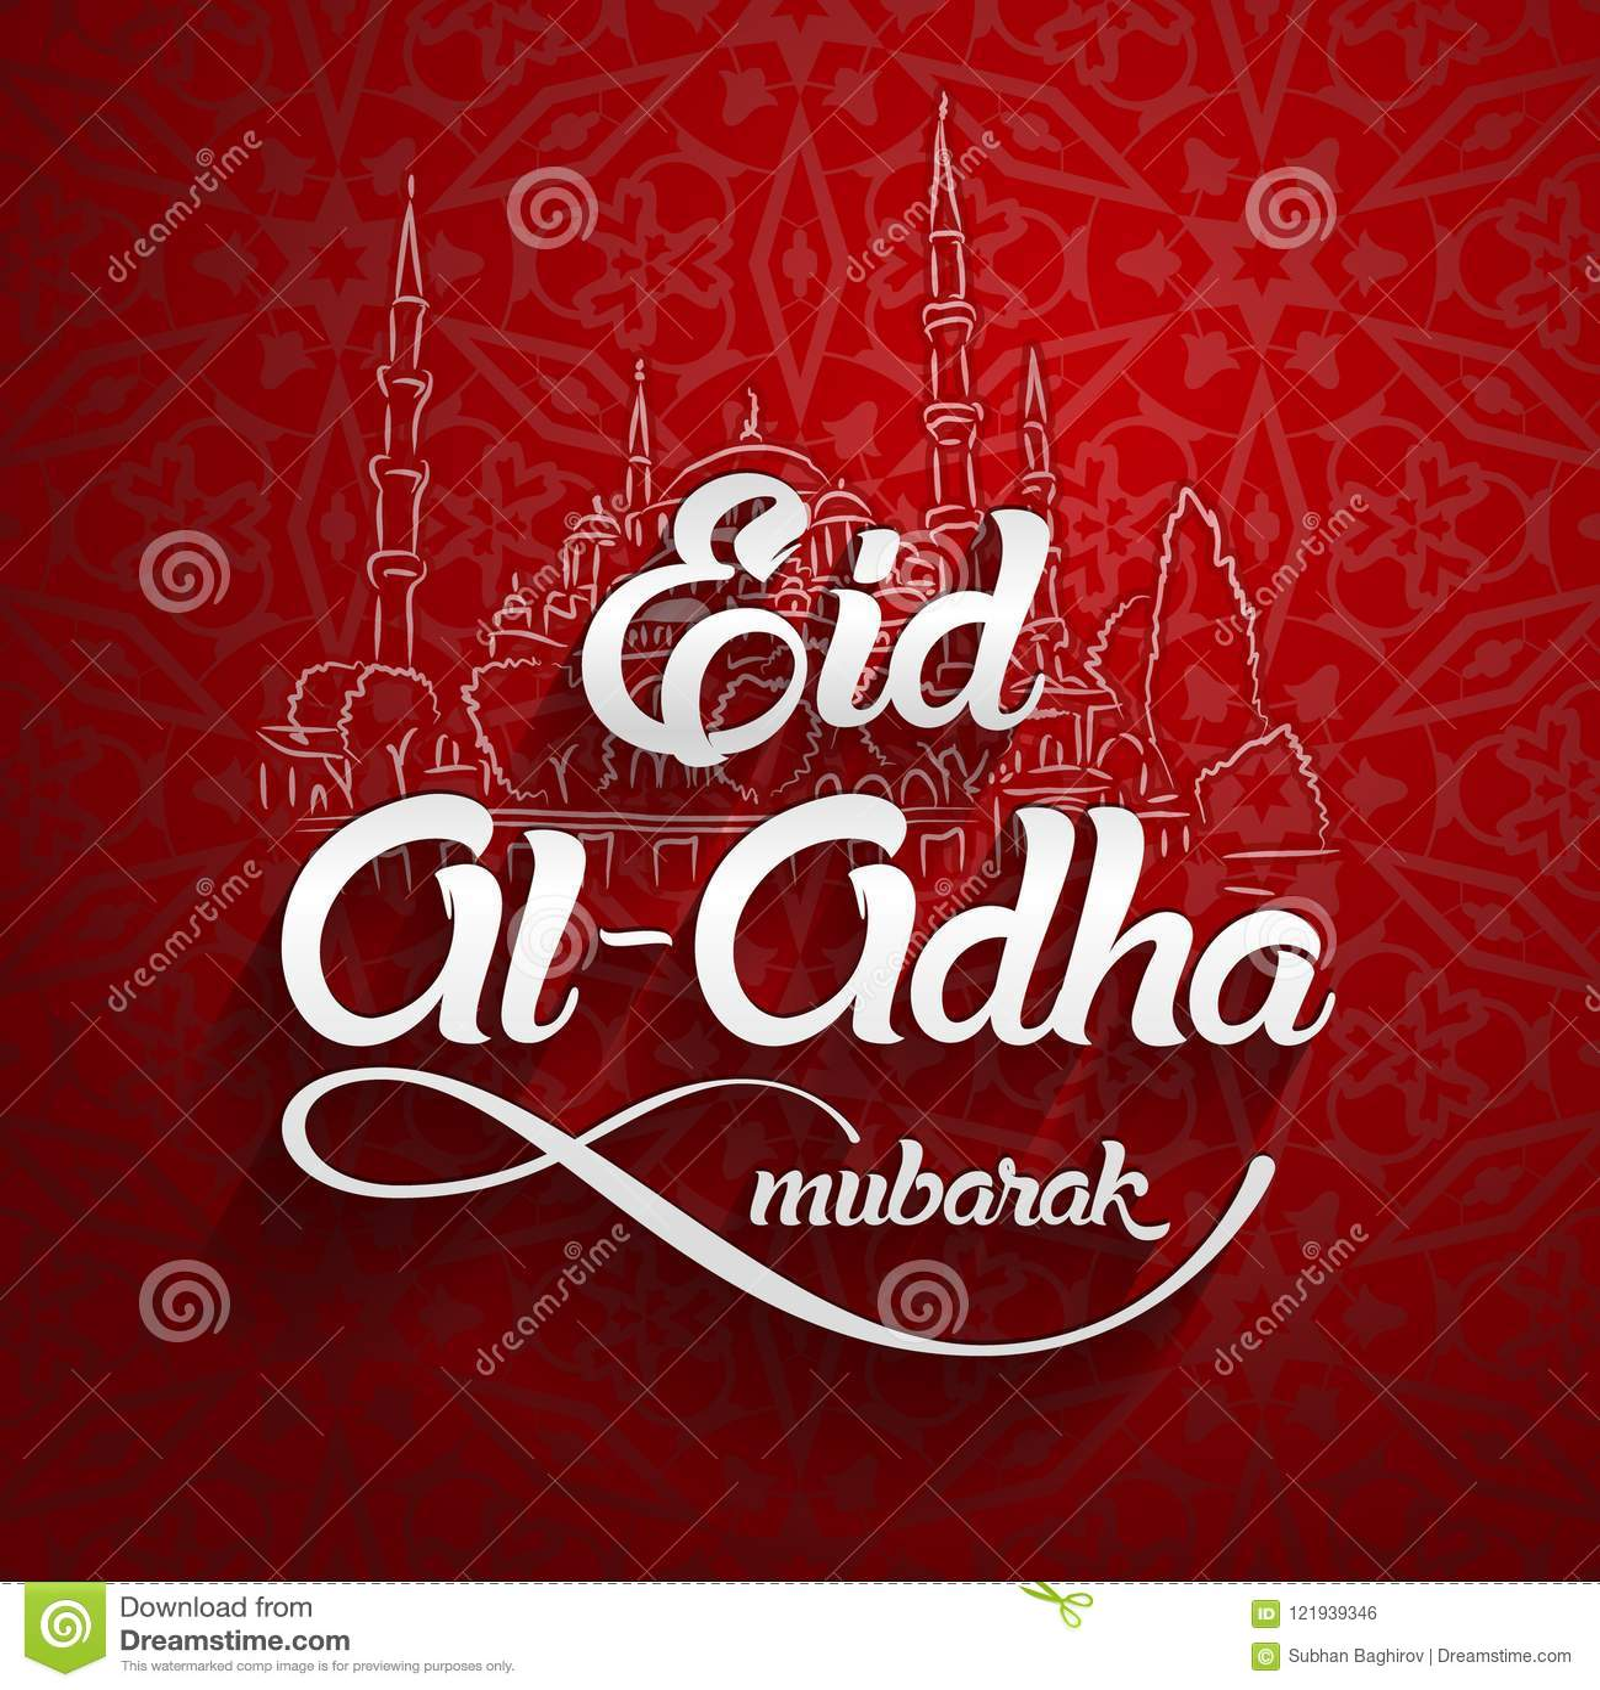 Eid al adha eid ul adha mubarak kurban bayrami kurban bajram kurban bayrami kurban bajram muslim festival of sacrifice greeting vector illustration m4hsunfo